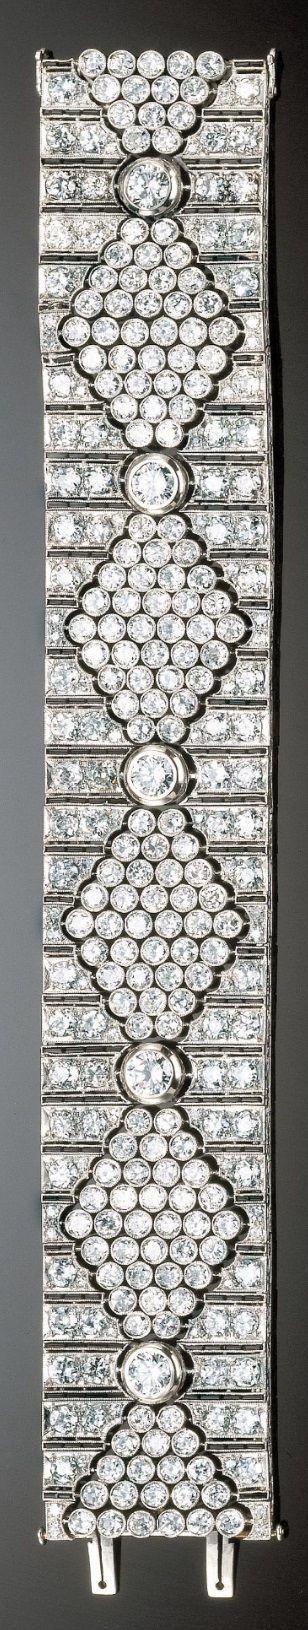 AN ART DECO PLATINUM, GOLD, ONYX AND DIAMOND BRACELET, 1930S. #ArtDeco #bracelet